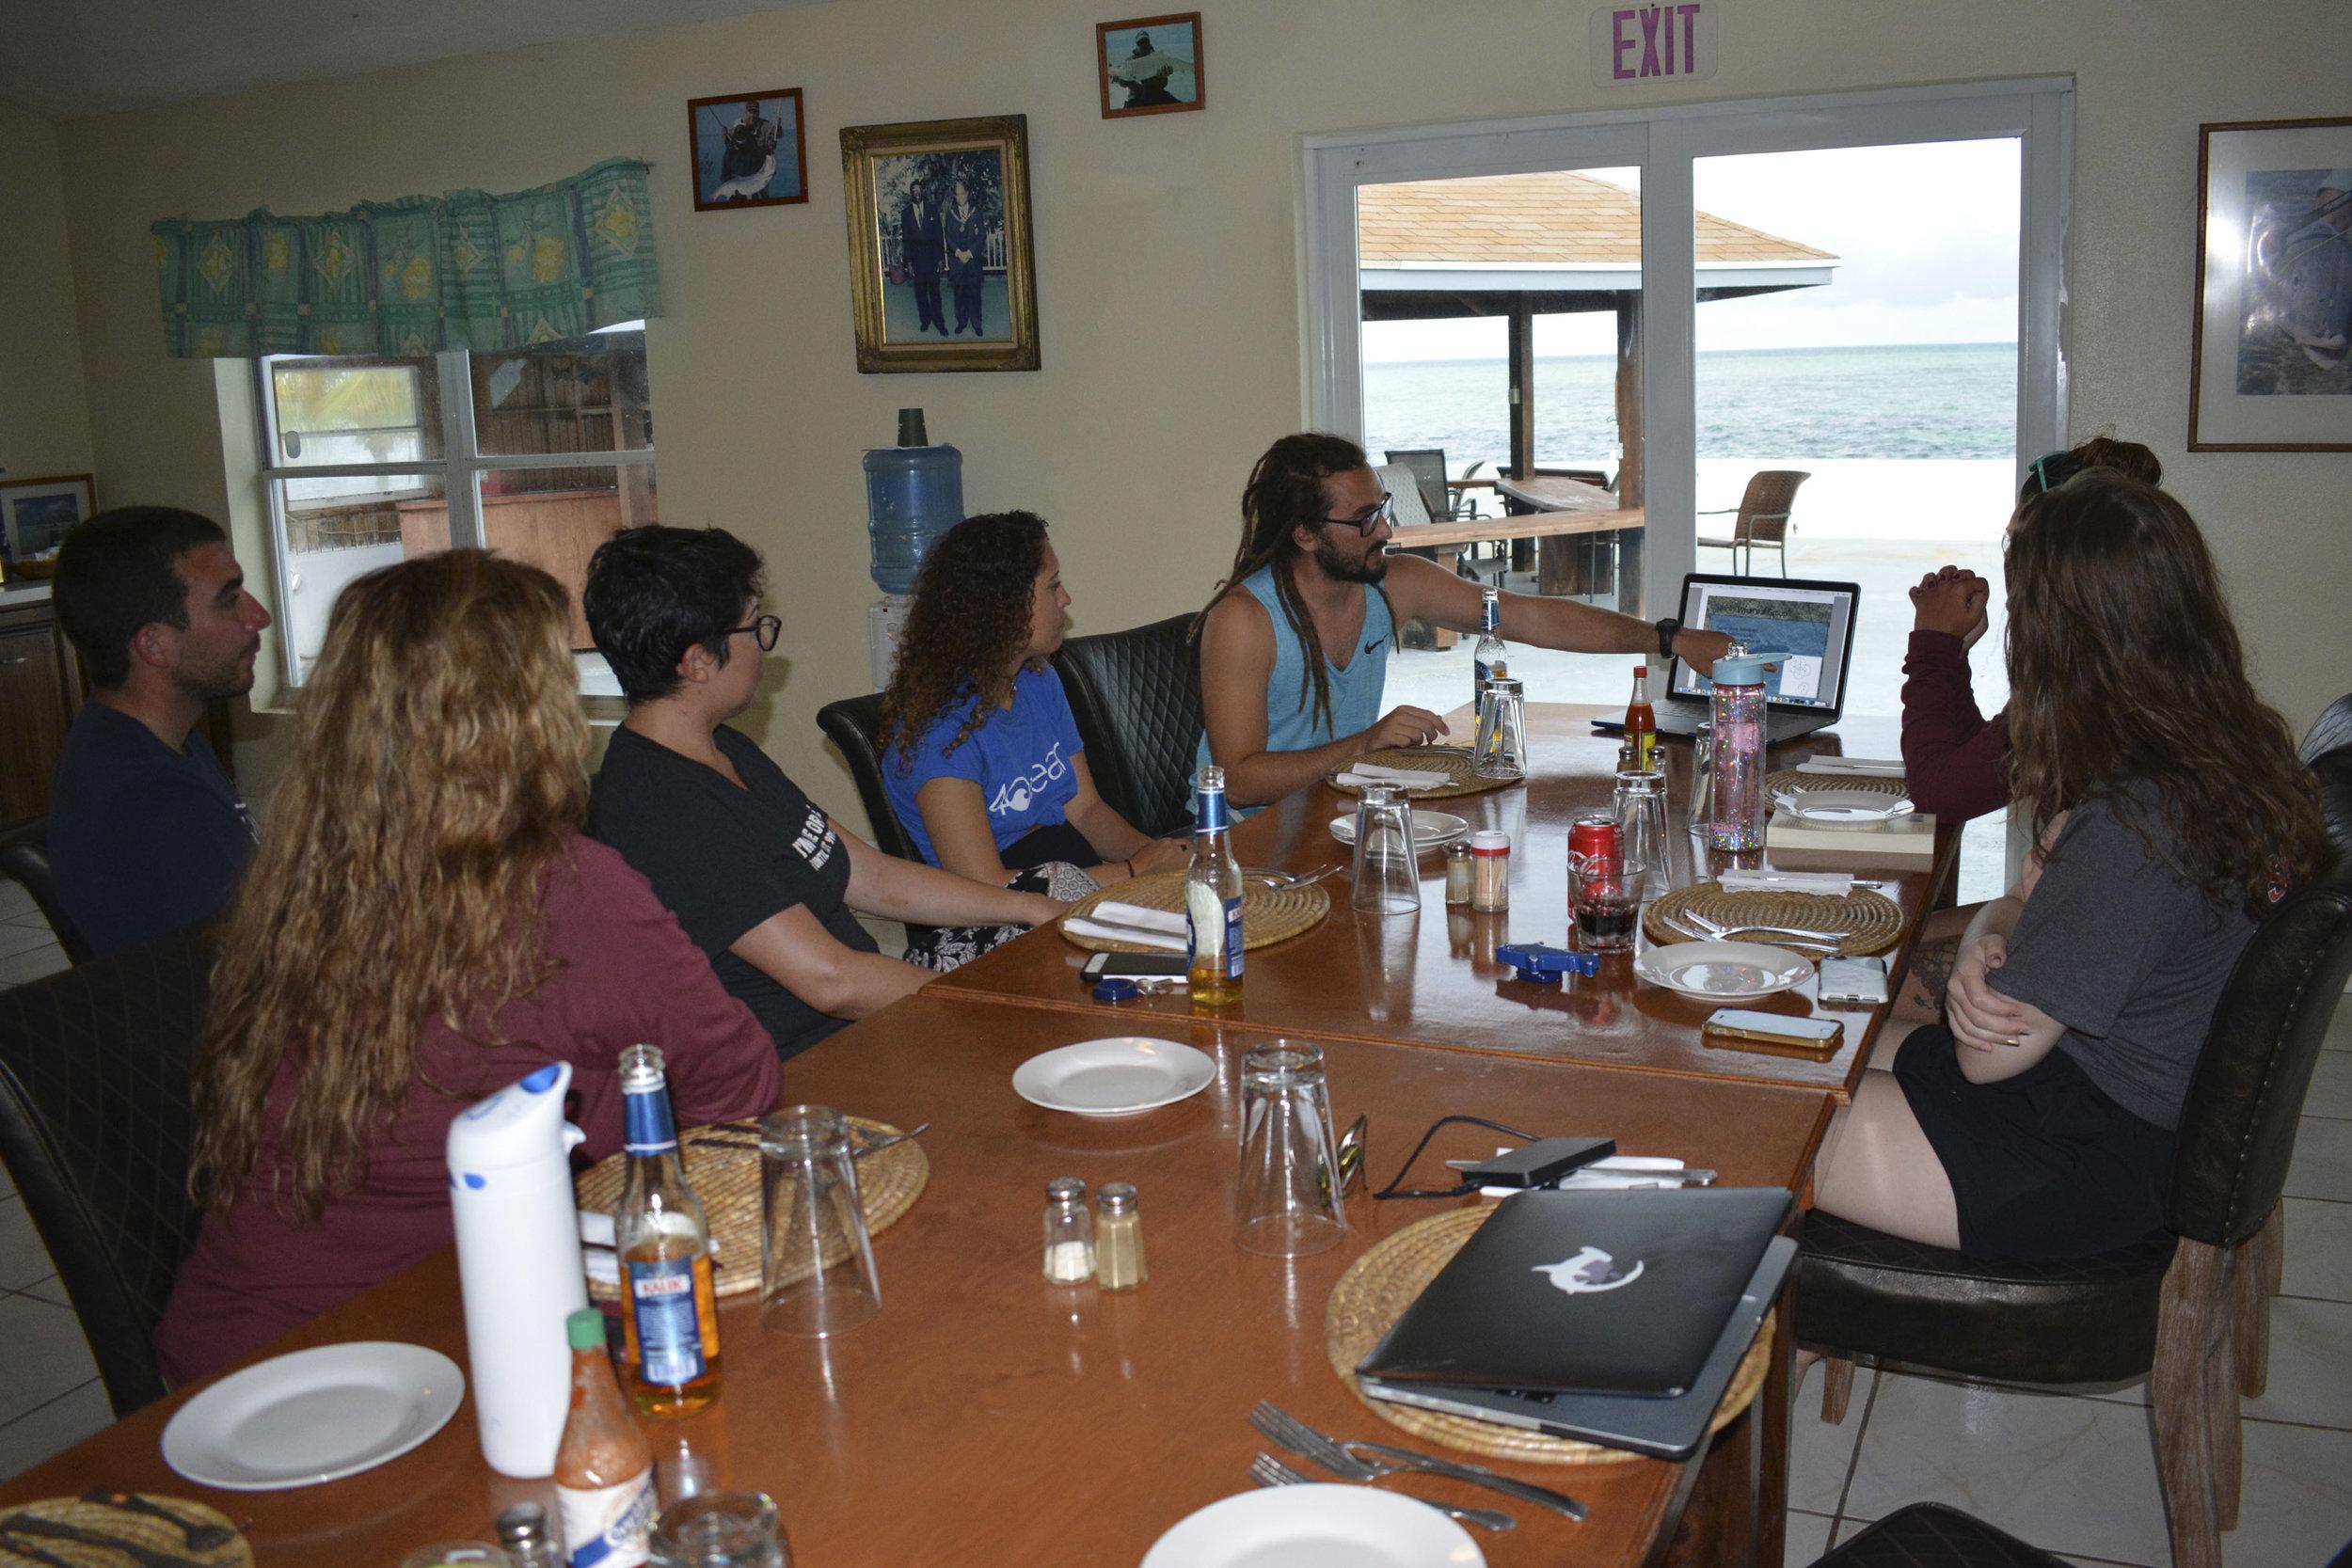 An evening lecture on shark social behavior